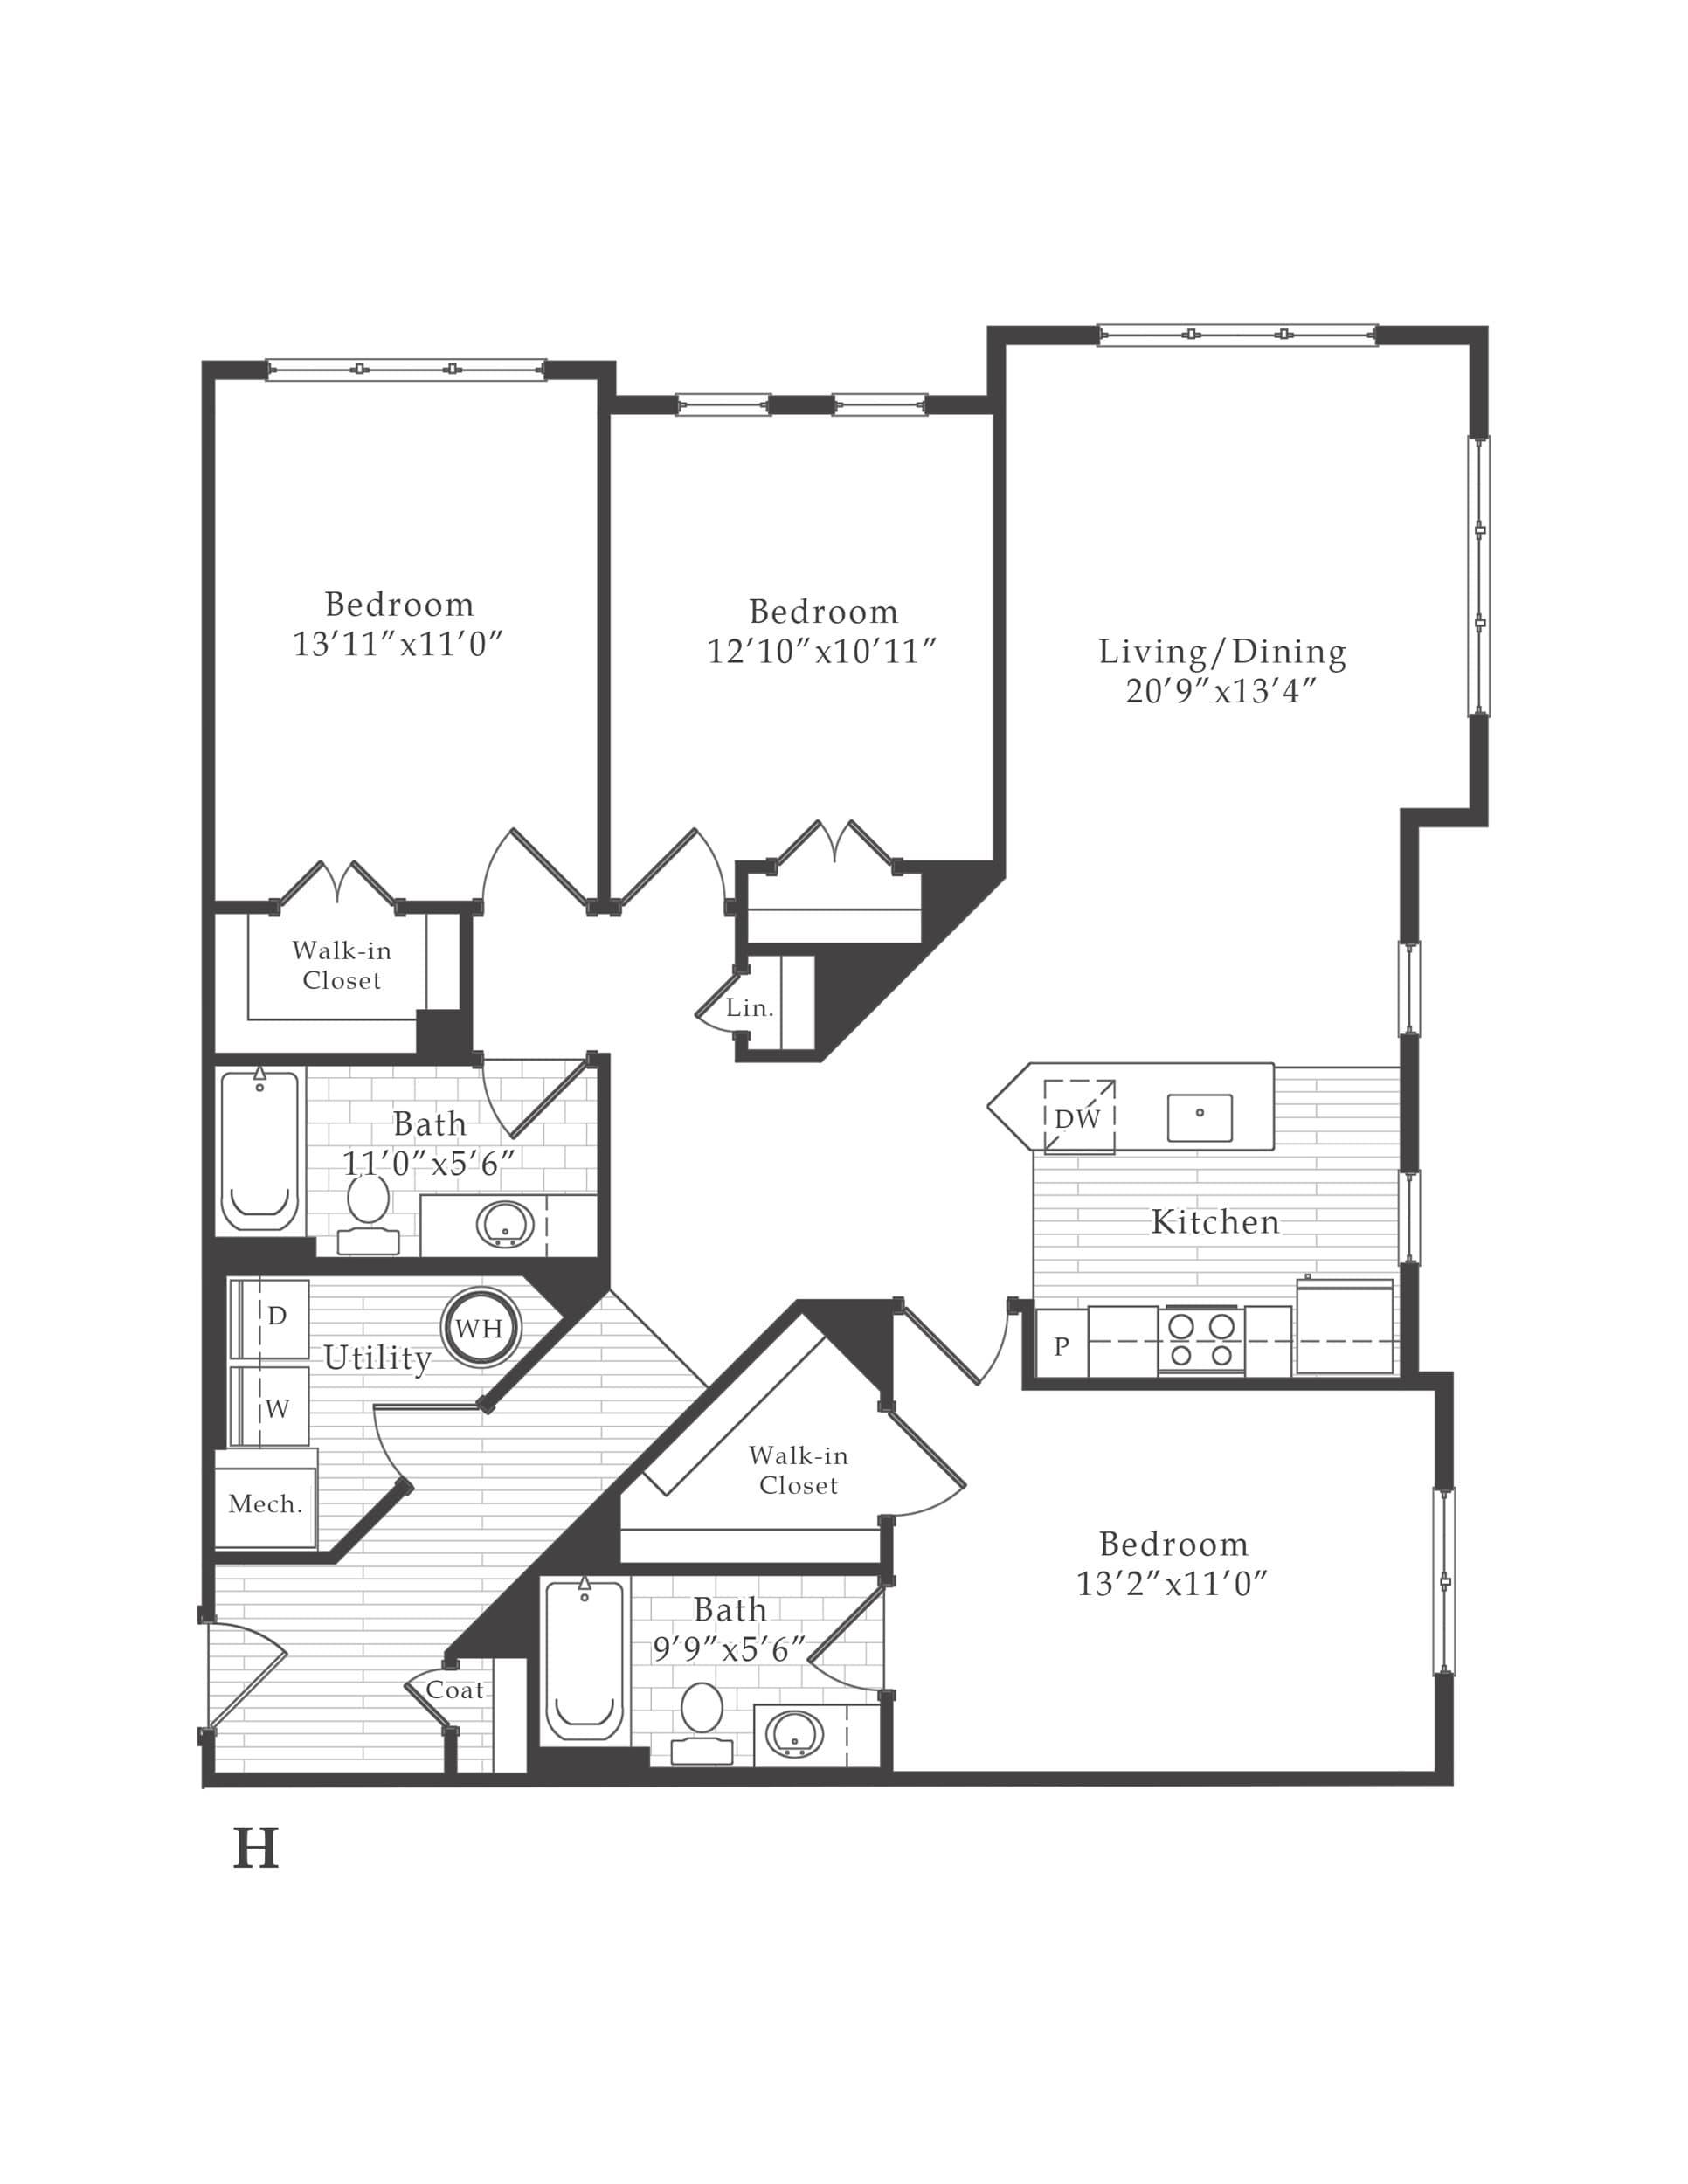 View The Vine Apartment Floor Plans - Studios, 1, 2, 3+ ...